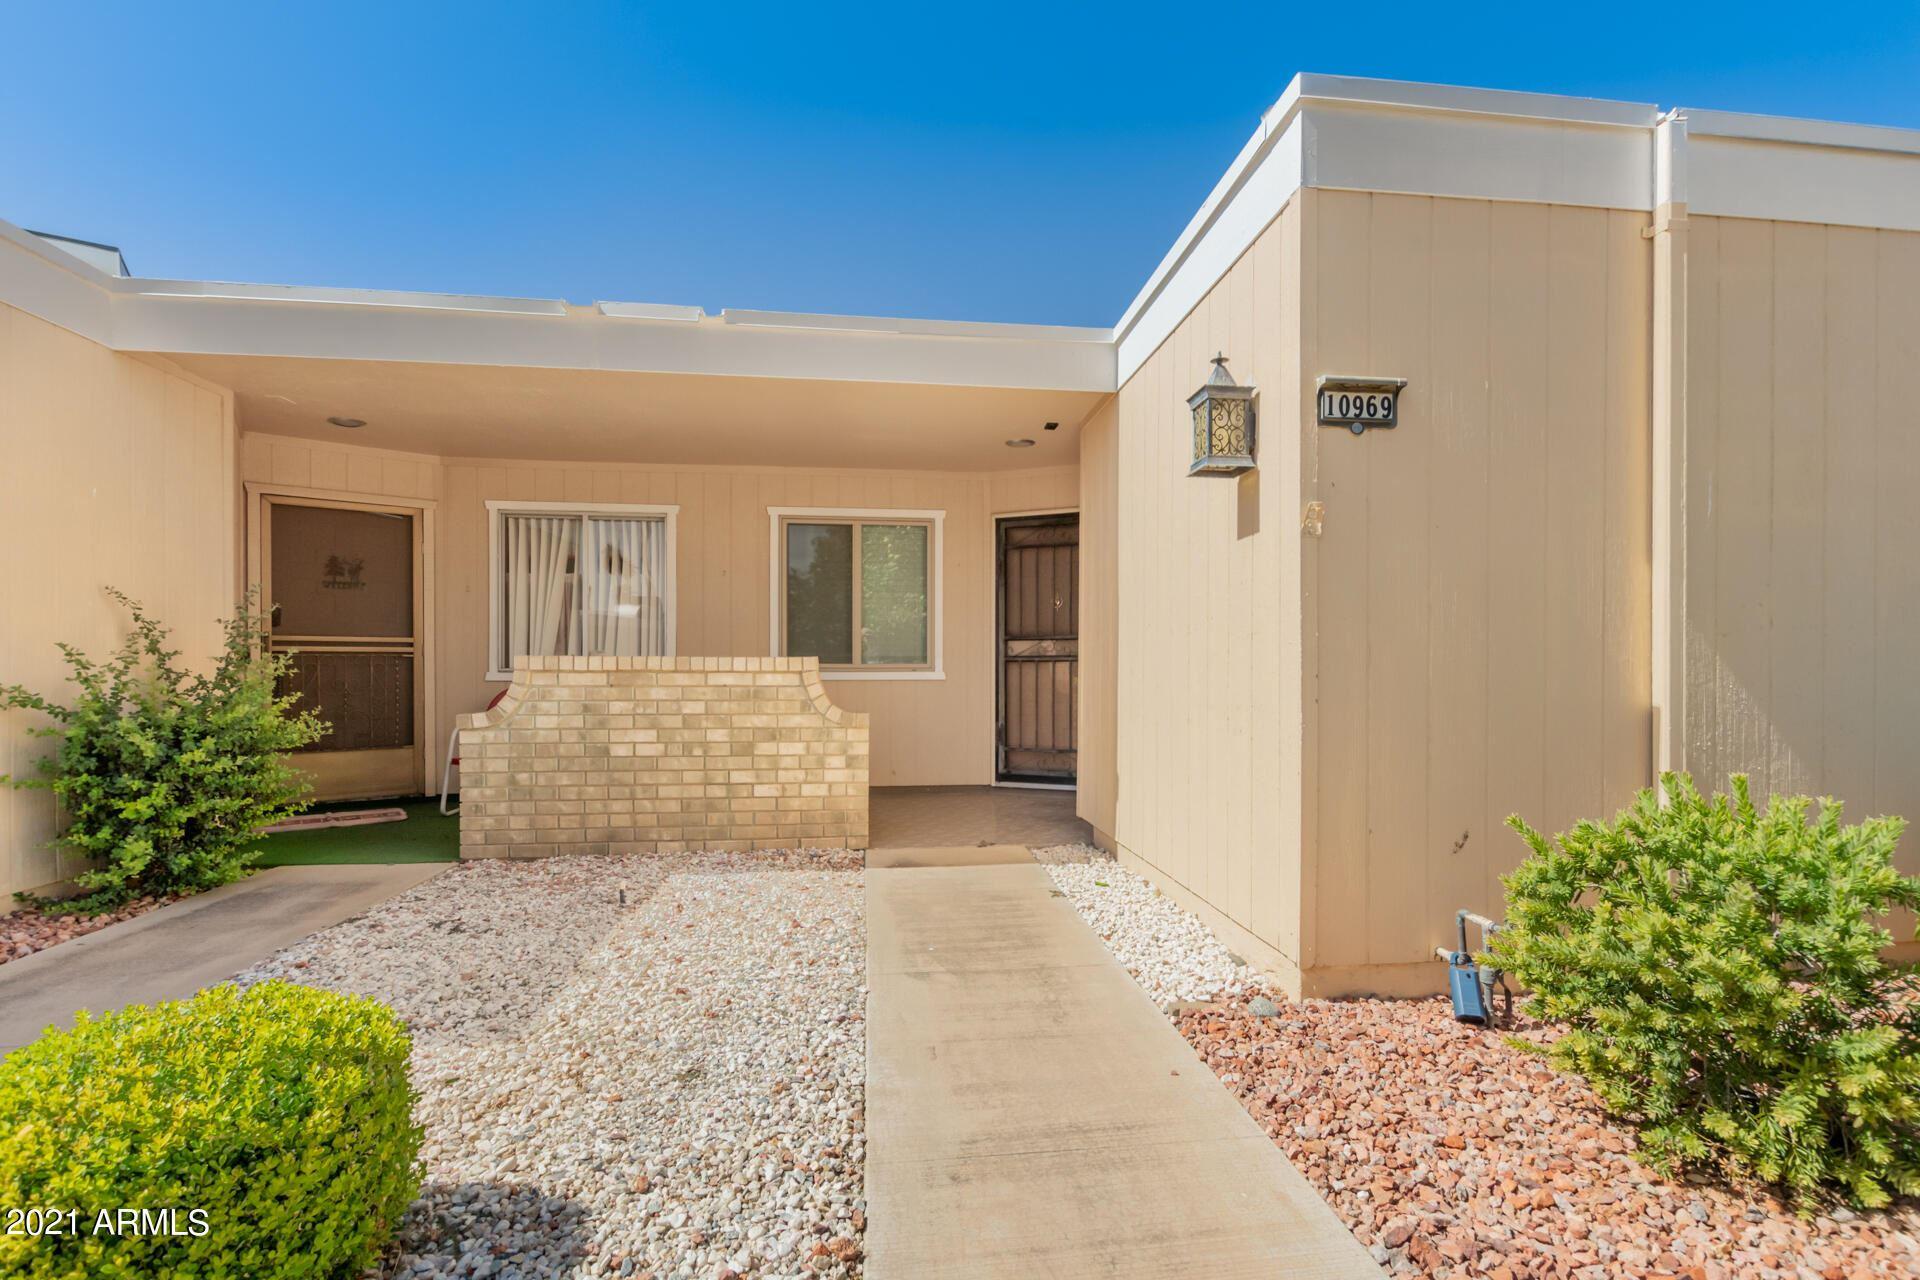 Photo of 10969 W Coggins Drive, Sun City, AZ 85351 (MLS # 6306818)